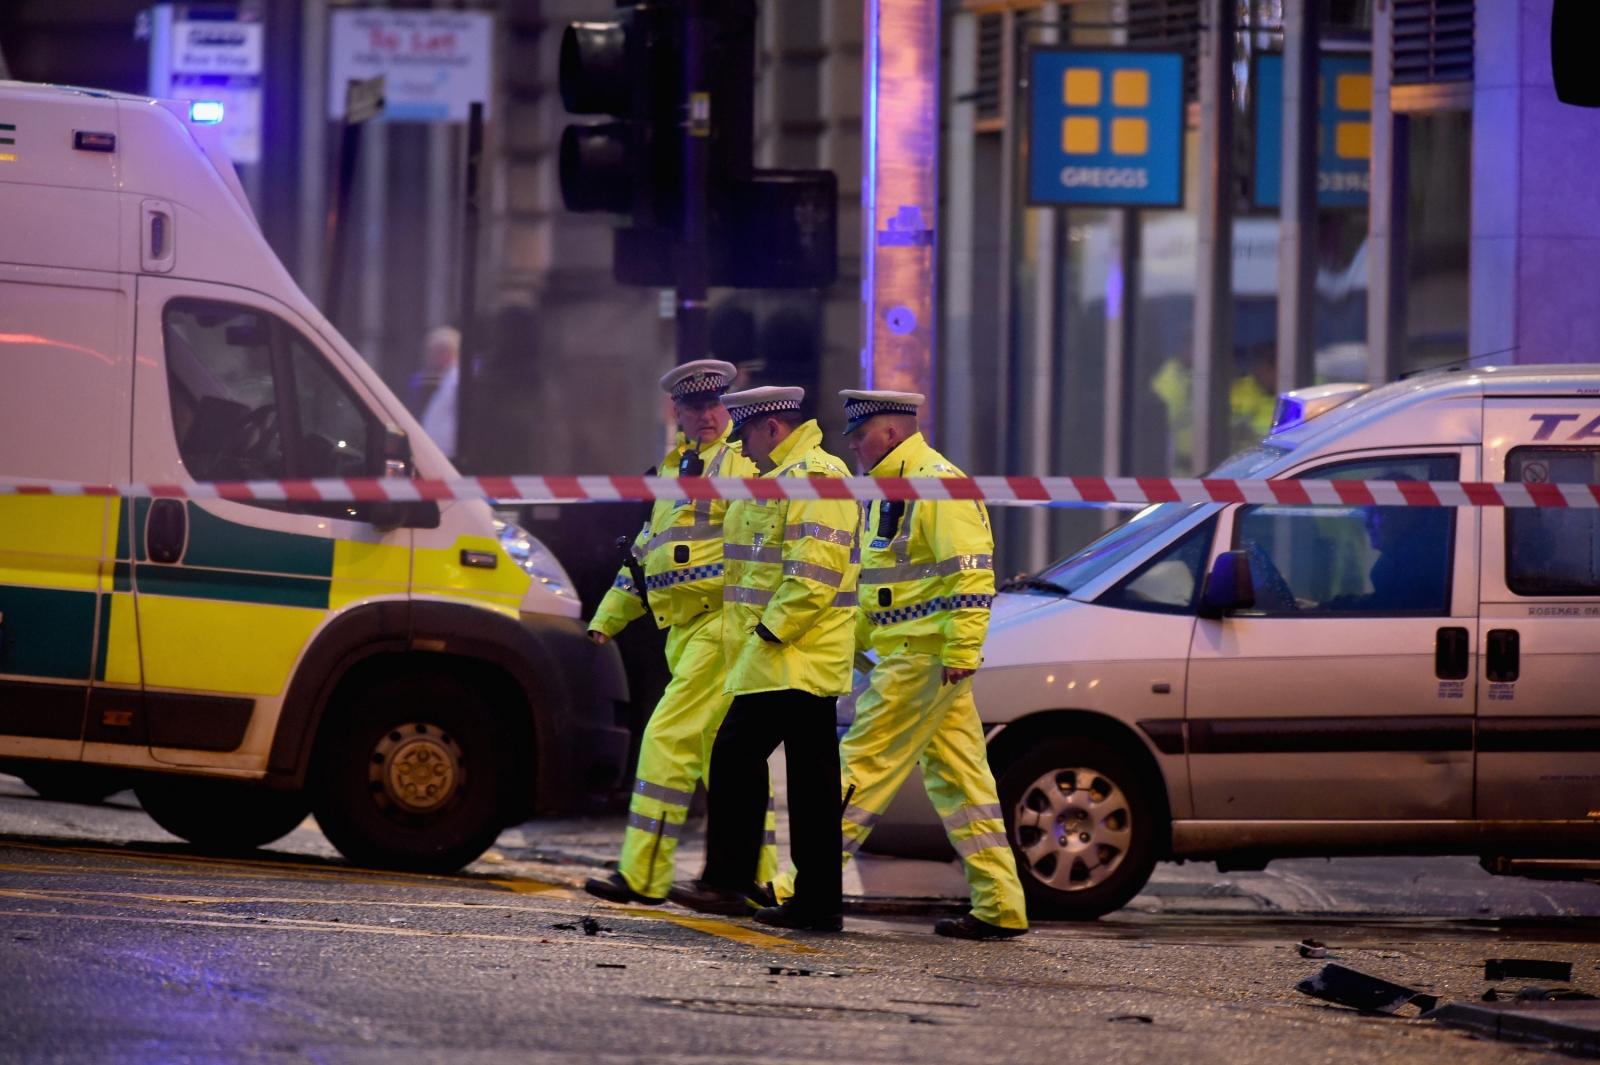 Bin lorry crash in Glasgow brings city-centre to a standstill